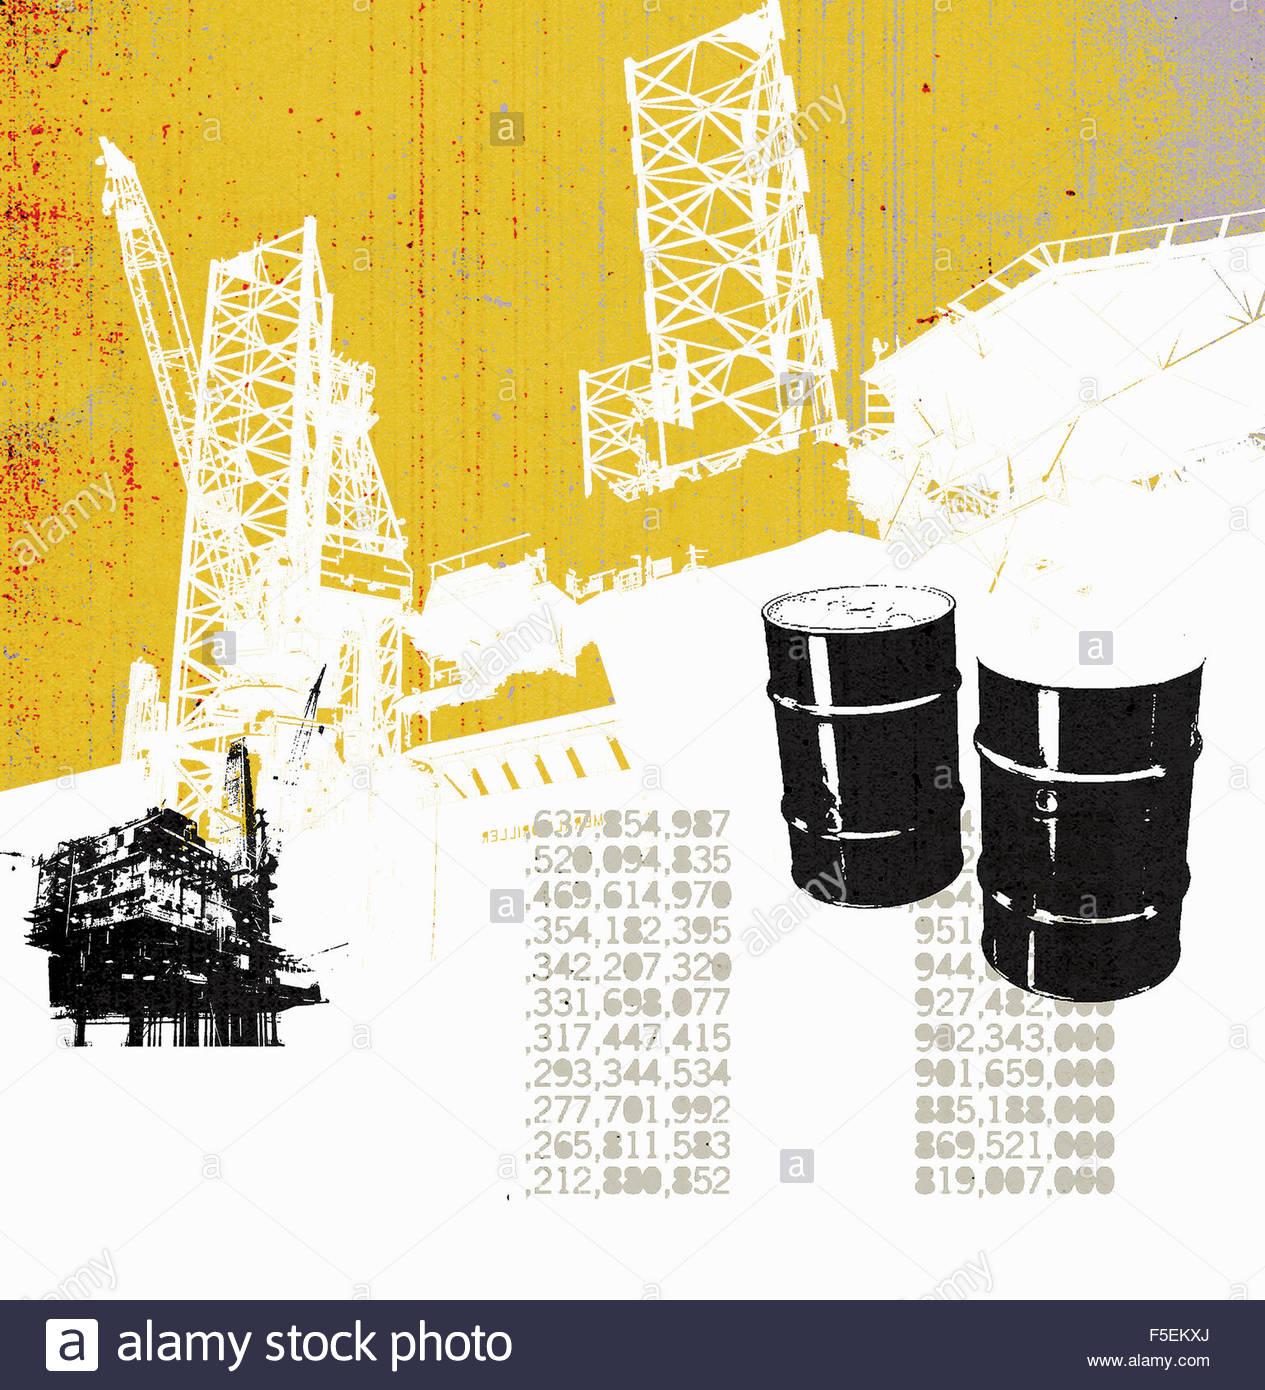 Barrel Erdöl und Öl-Produktions-Plattform mit Aktienkursen Stockbild